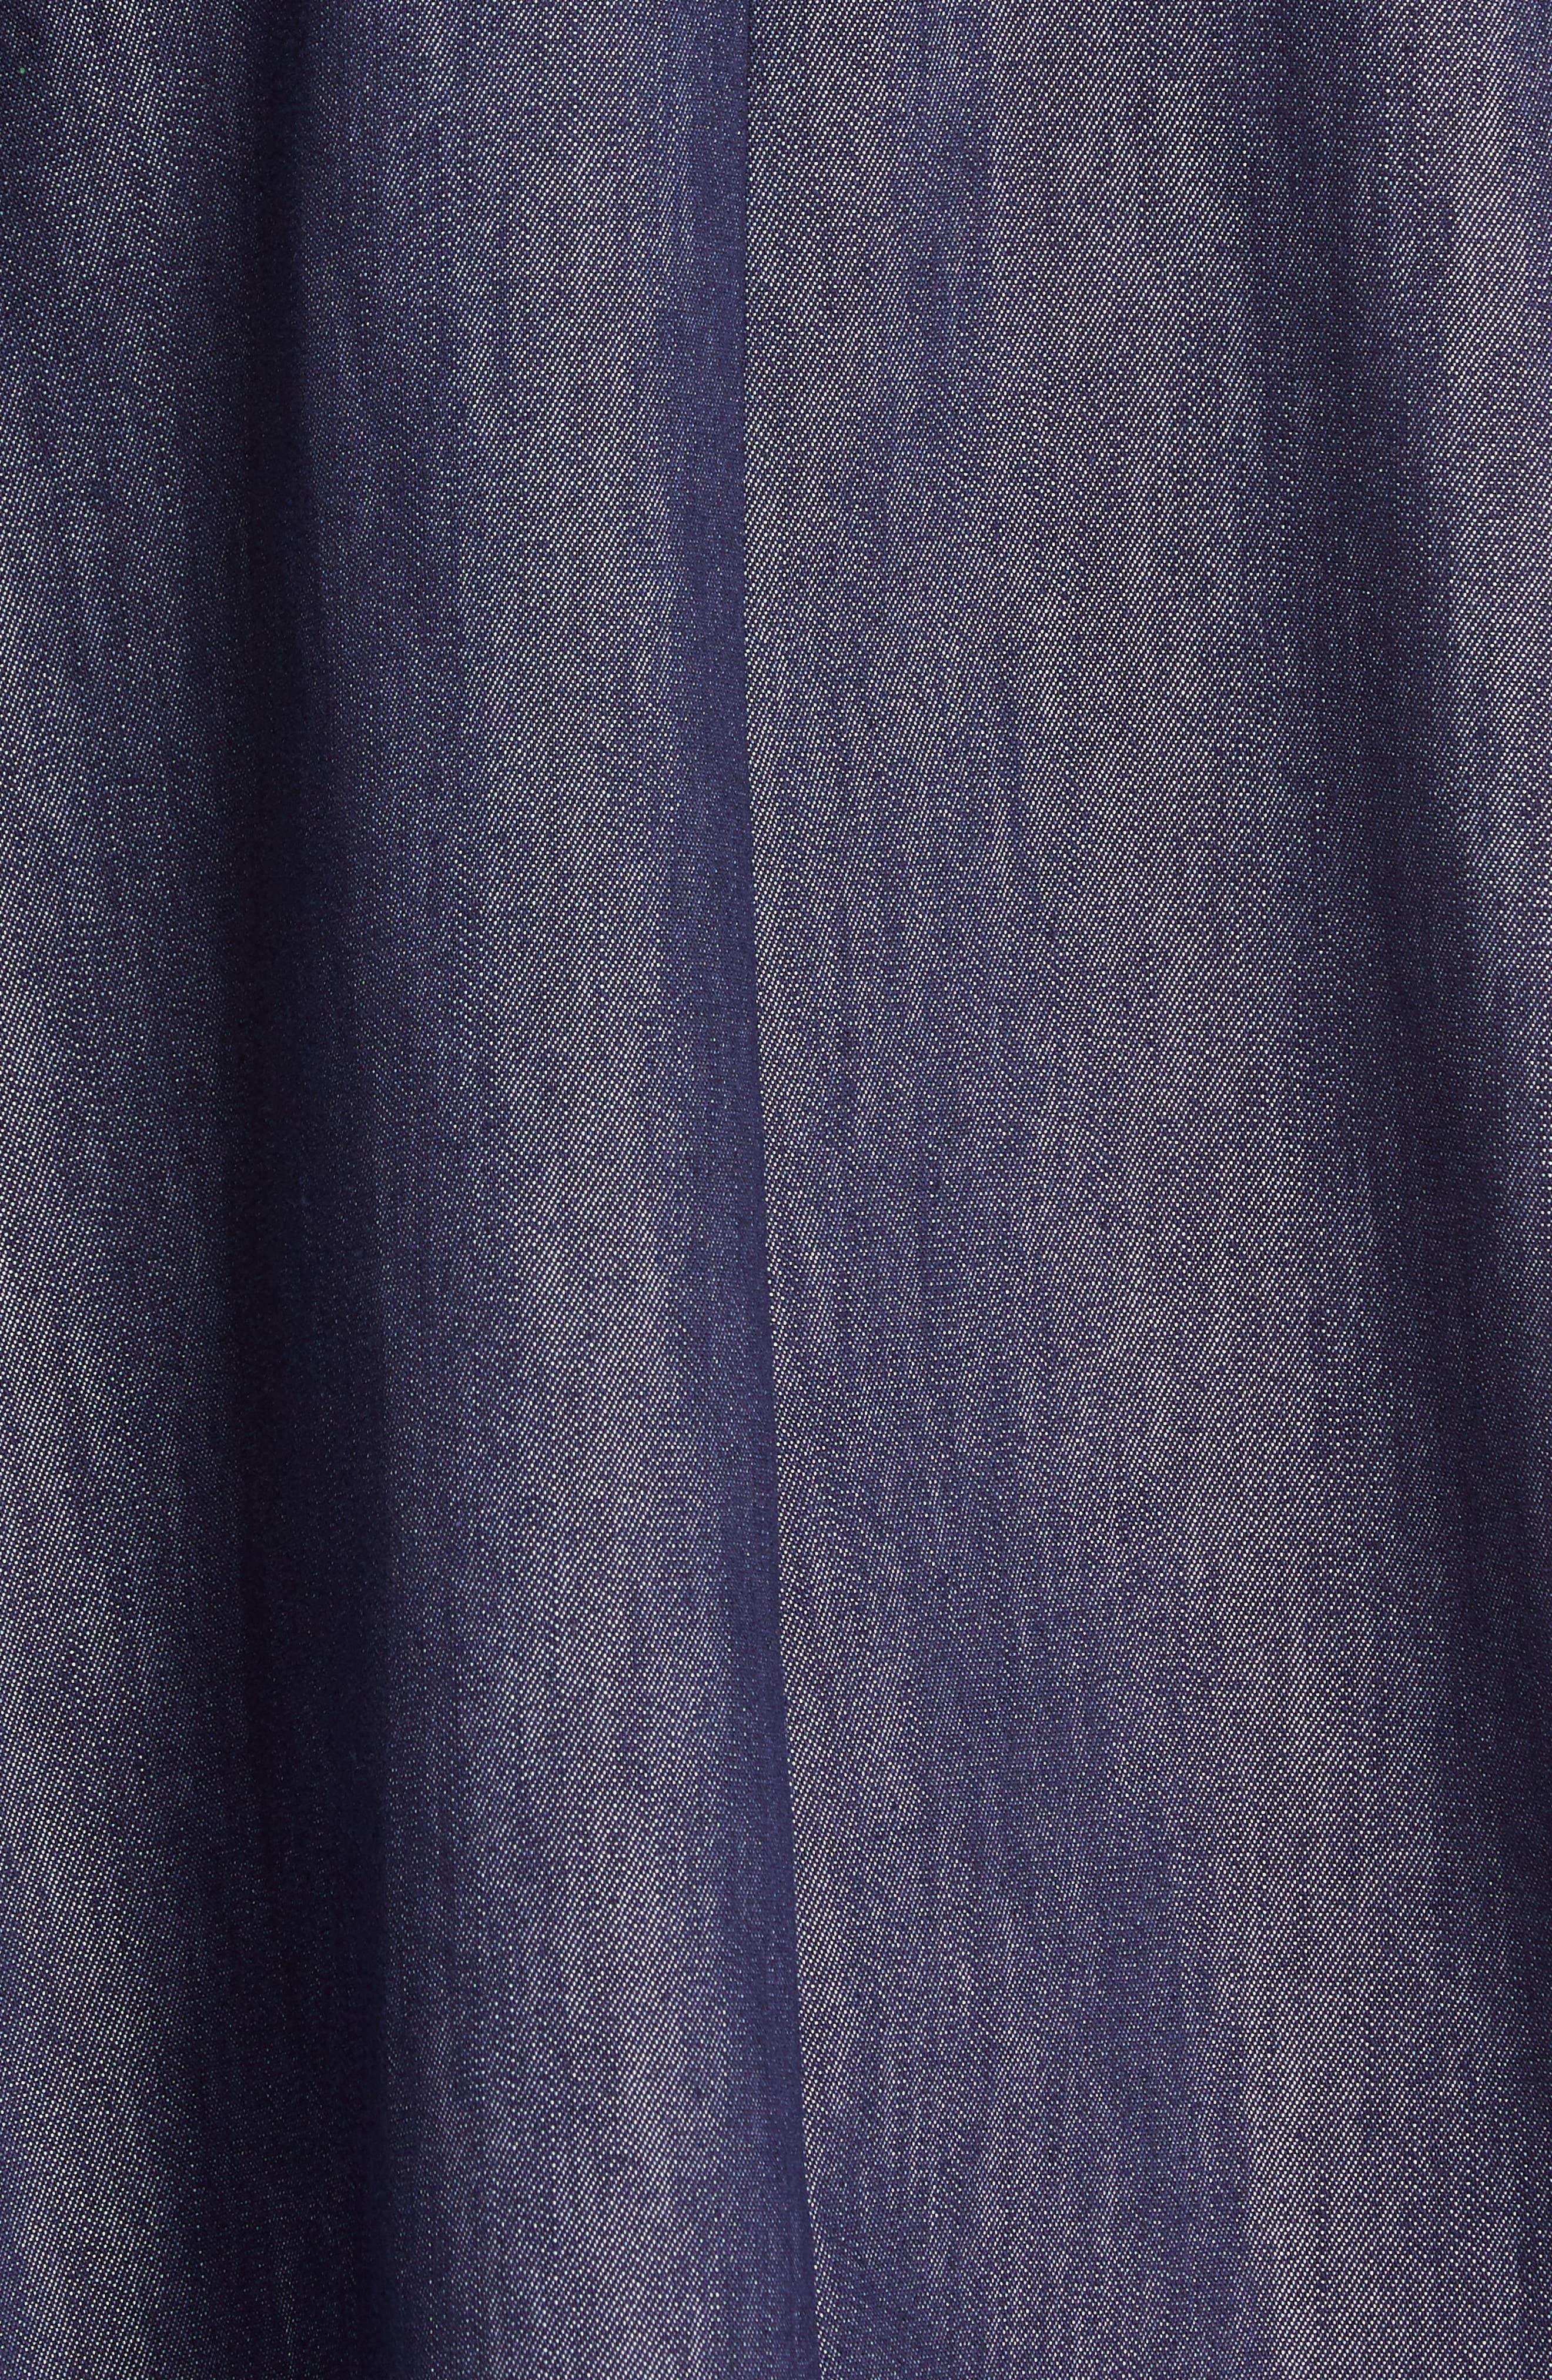 TOMMY X ZENDAYA, Belted Denim Skirt, Alternate thumbnail 5, color, 402